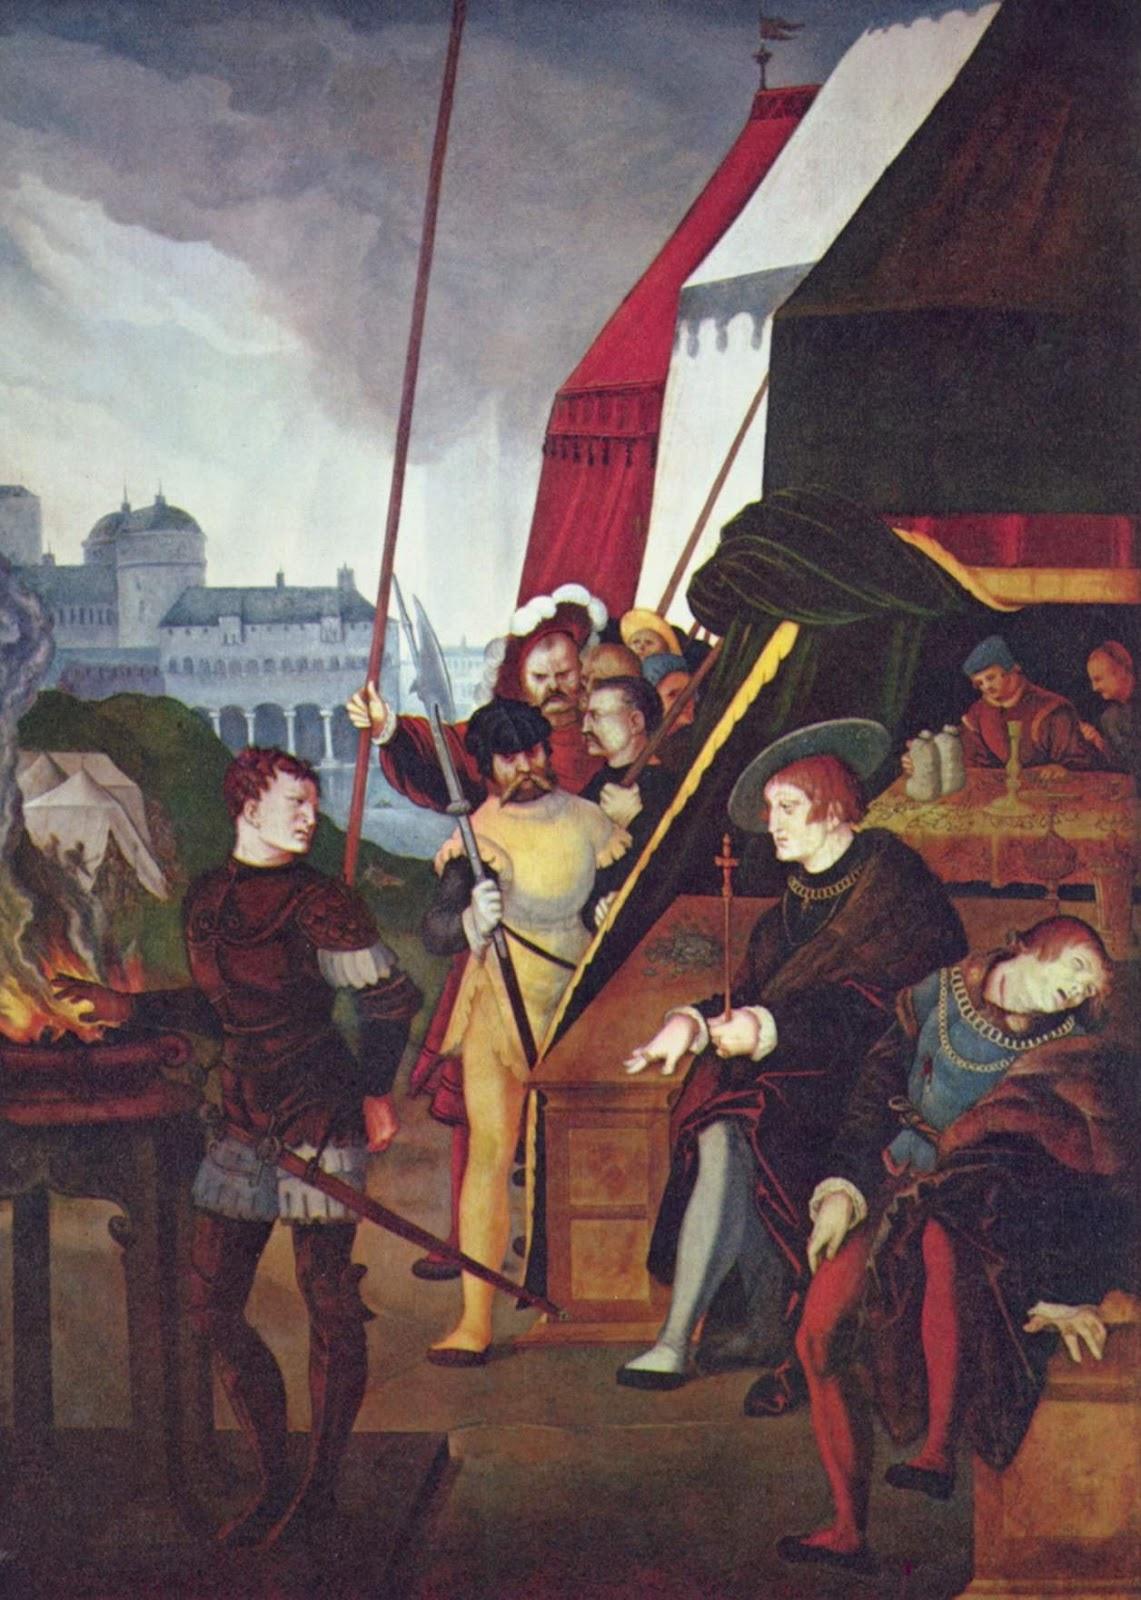 Hans Baldung (1485-1545)-'Mucius Scaevola and Porsenna'- 1531